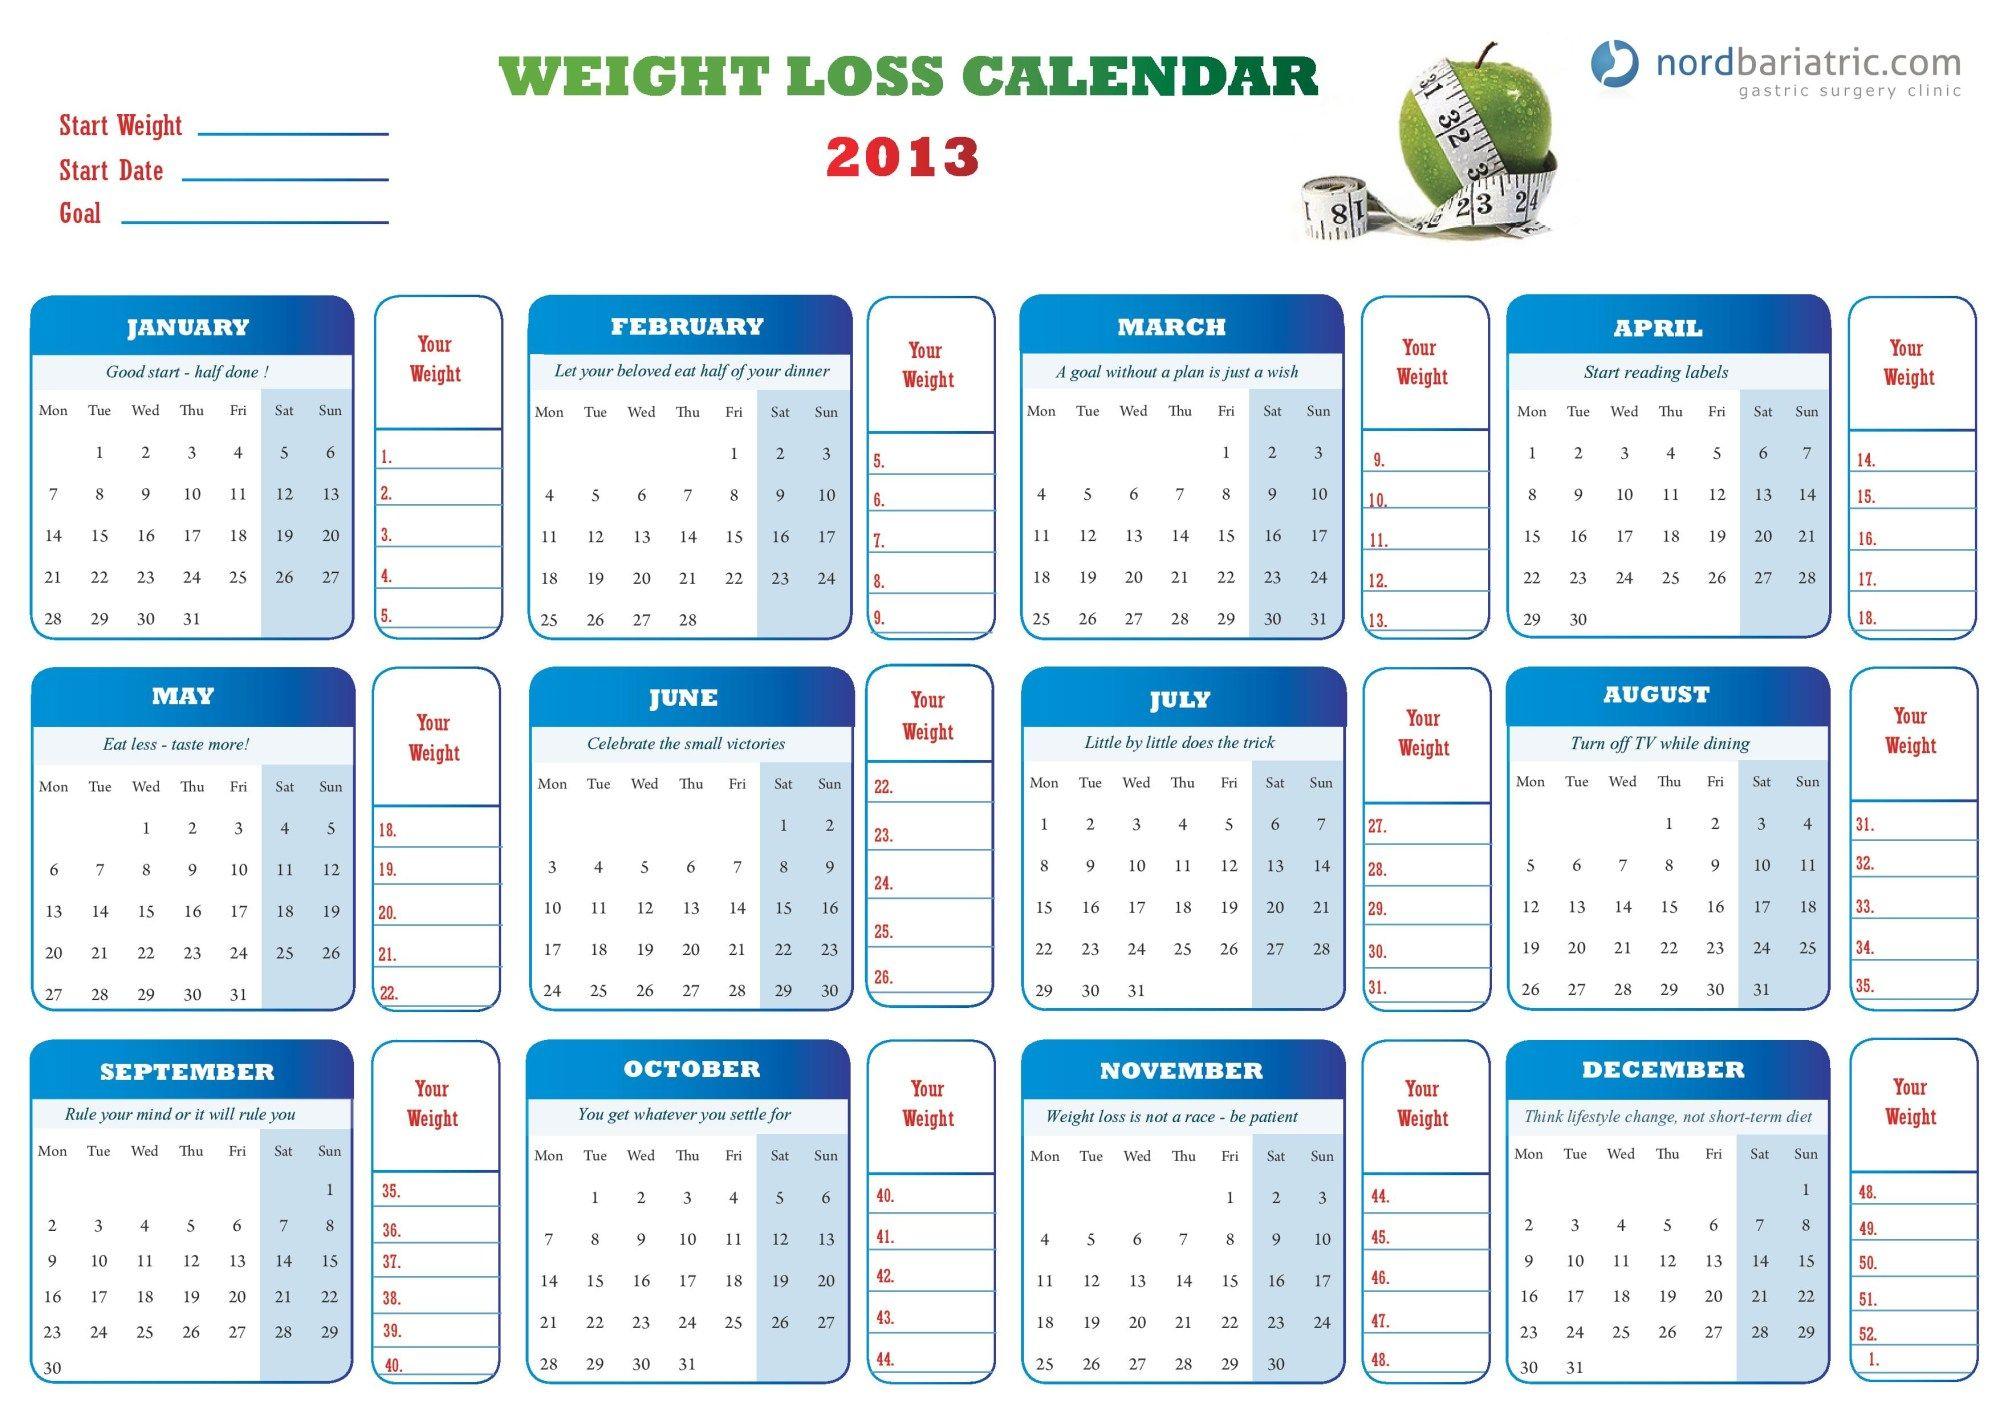 Weight loss calendar for 2013 printable pinterest weight weight loss calendar for 2013 nvjuhfo Choice Image